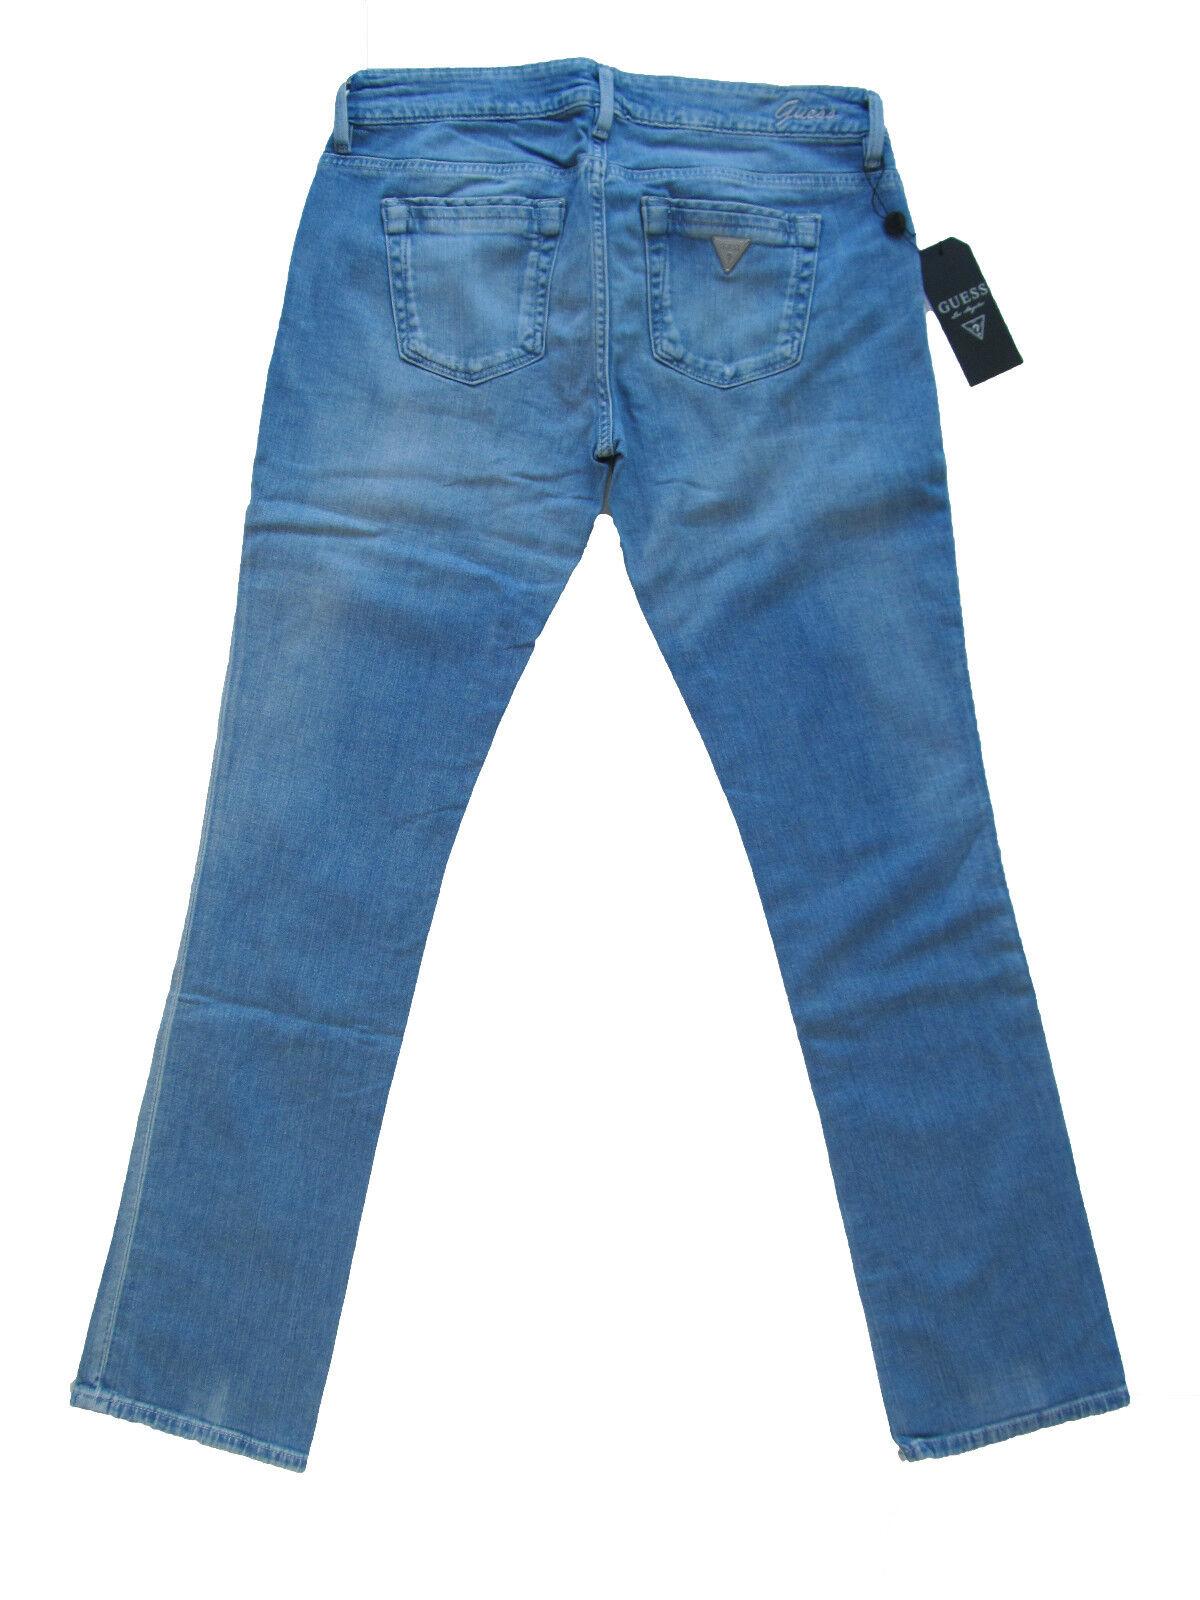 Guess Jeans Hose Pants Starlet Skinny Leg Slim Fit Blau W21125 Neu 31 32